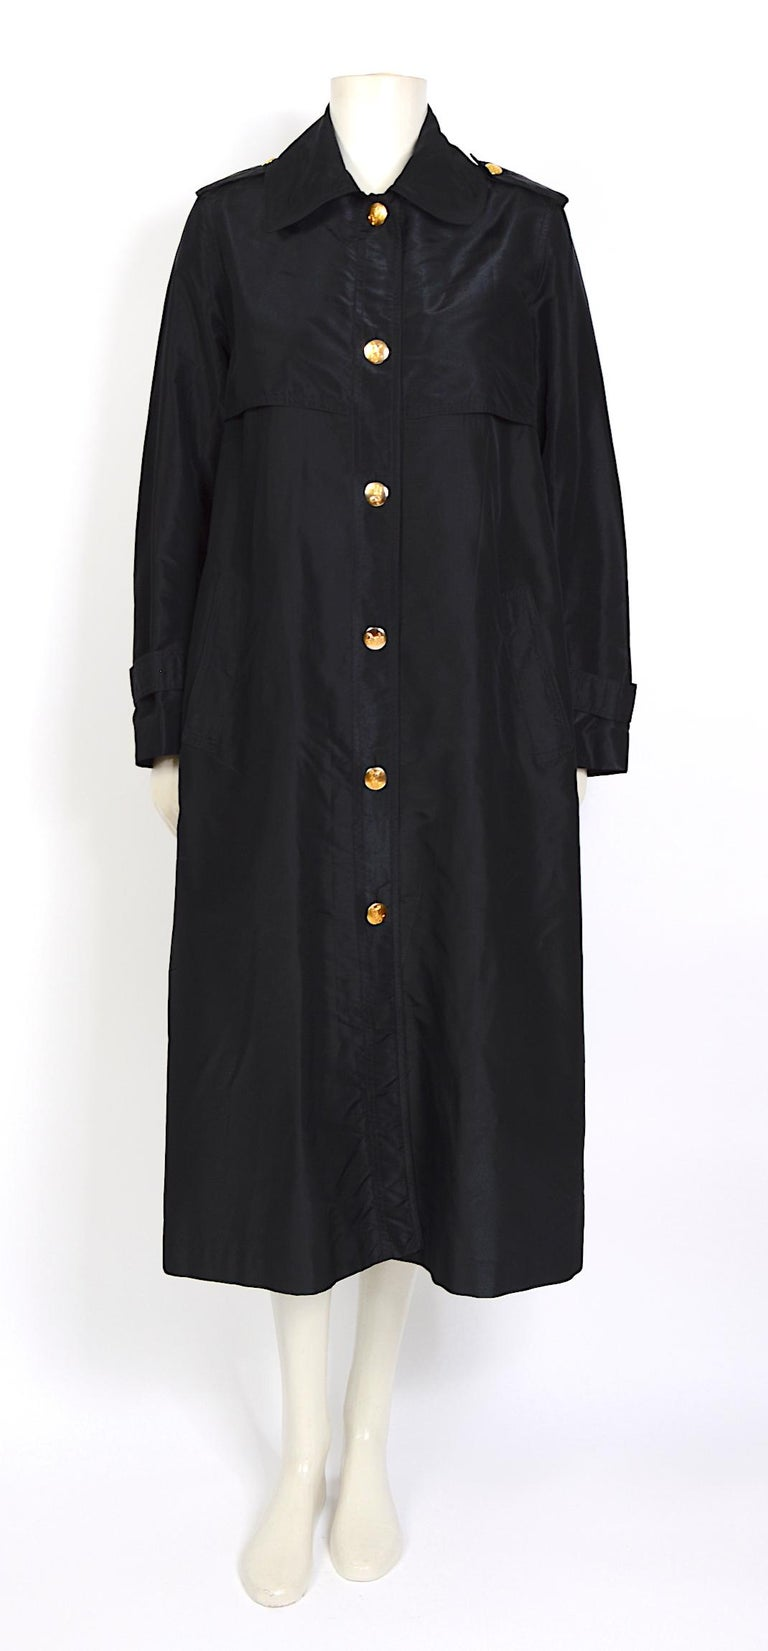 Celine vintage signature gold buttons and black silk crispy taffeta coat For Sale 2